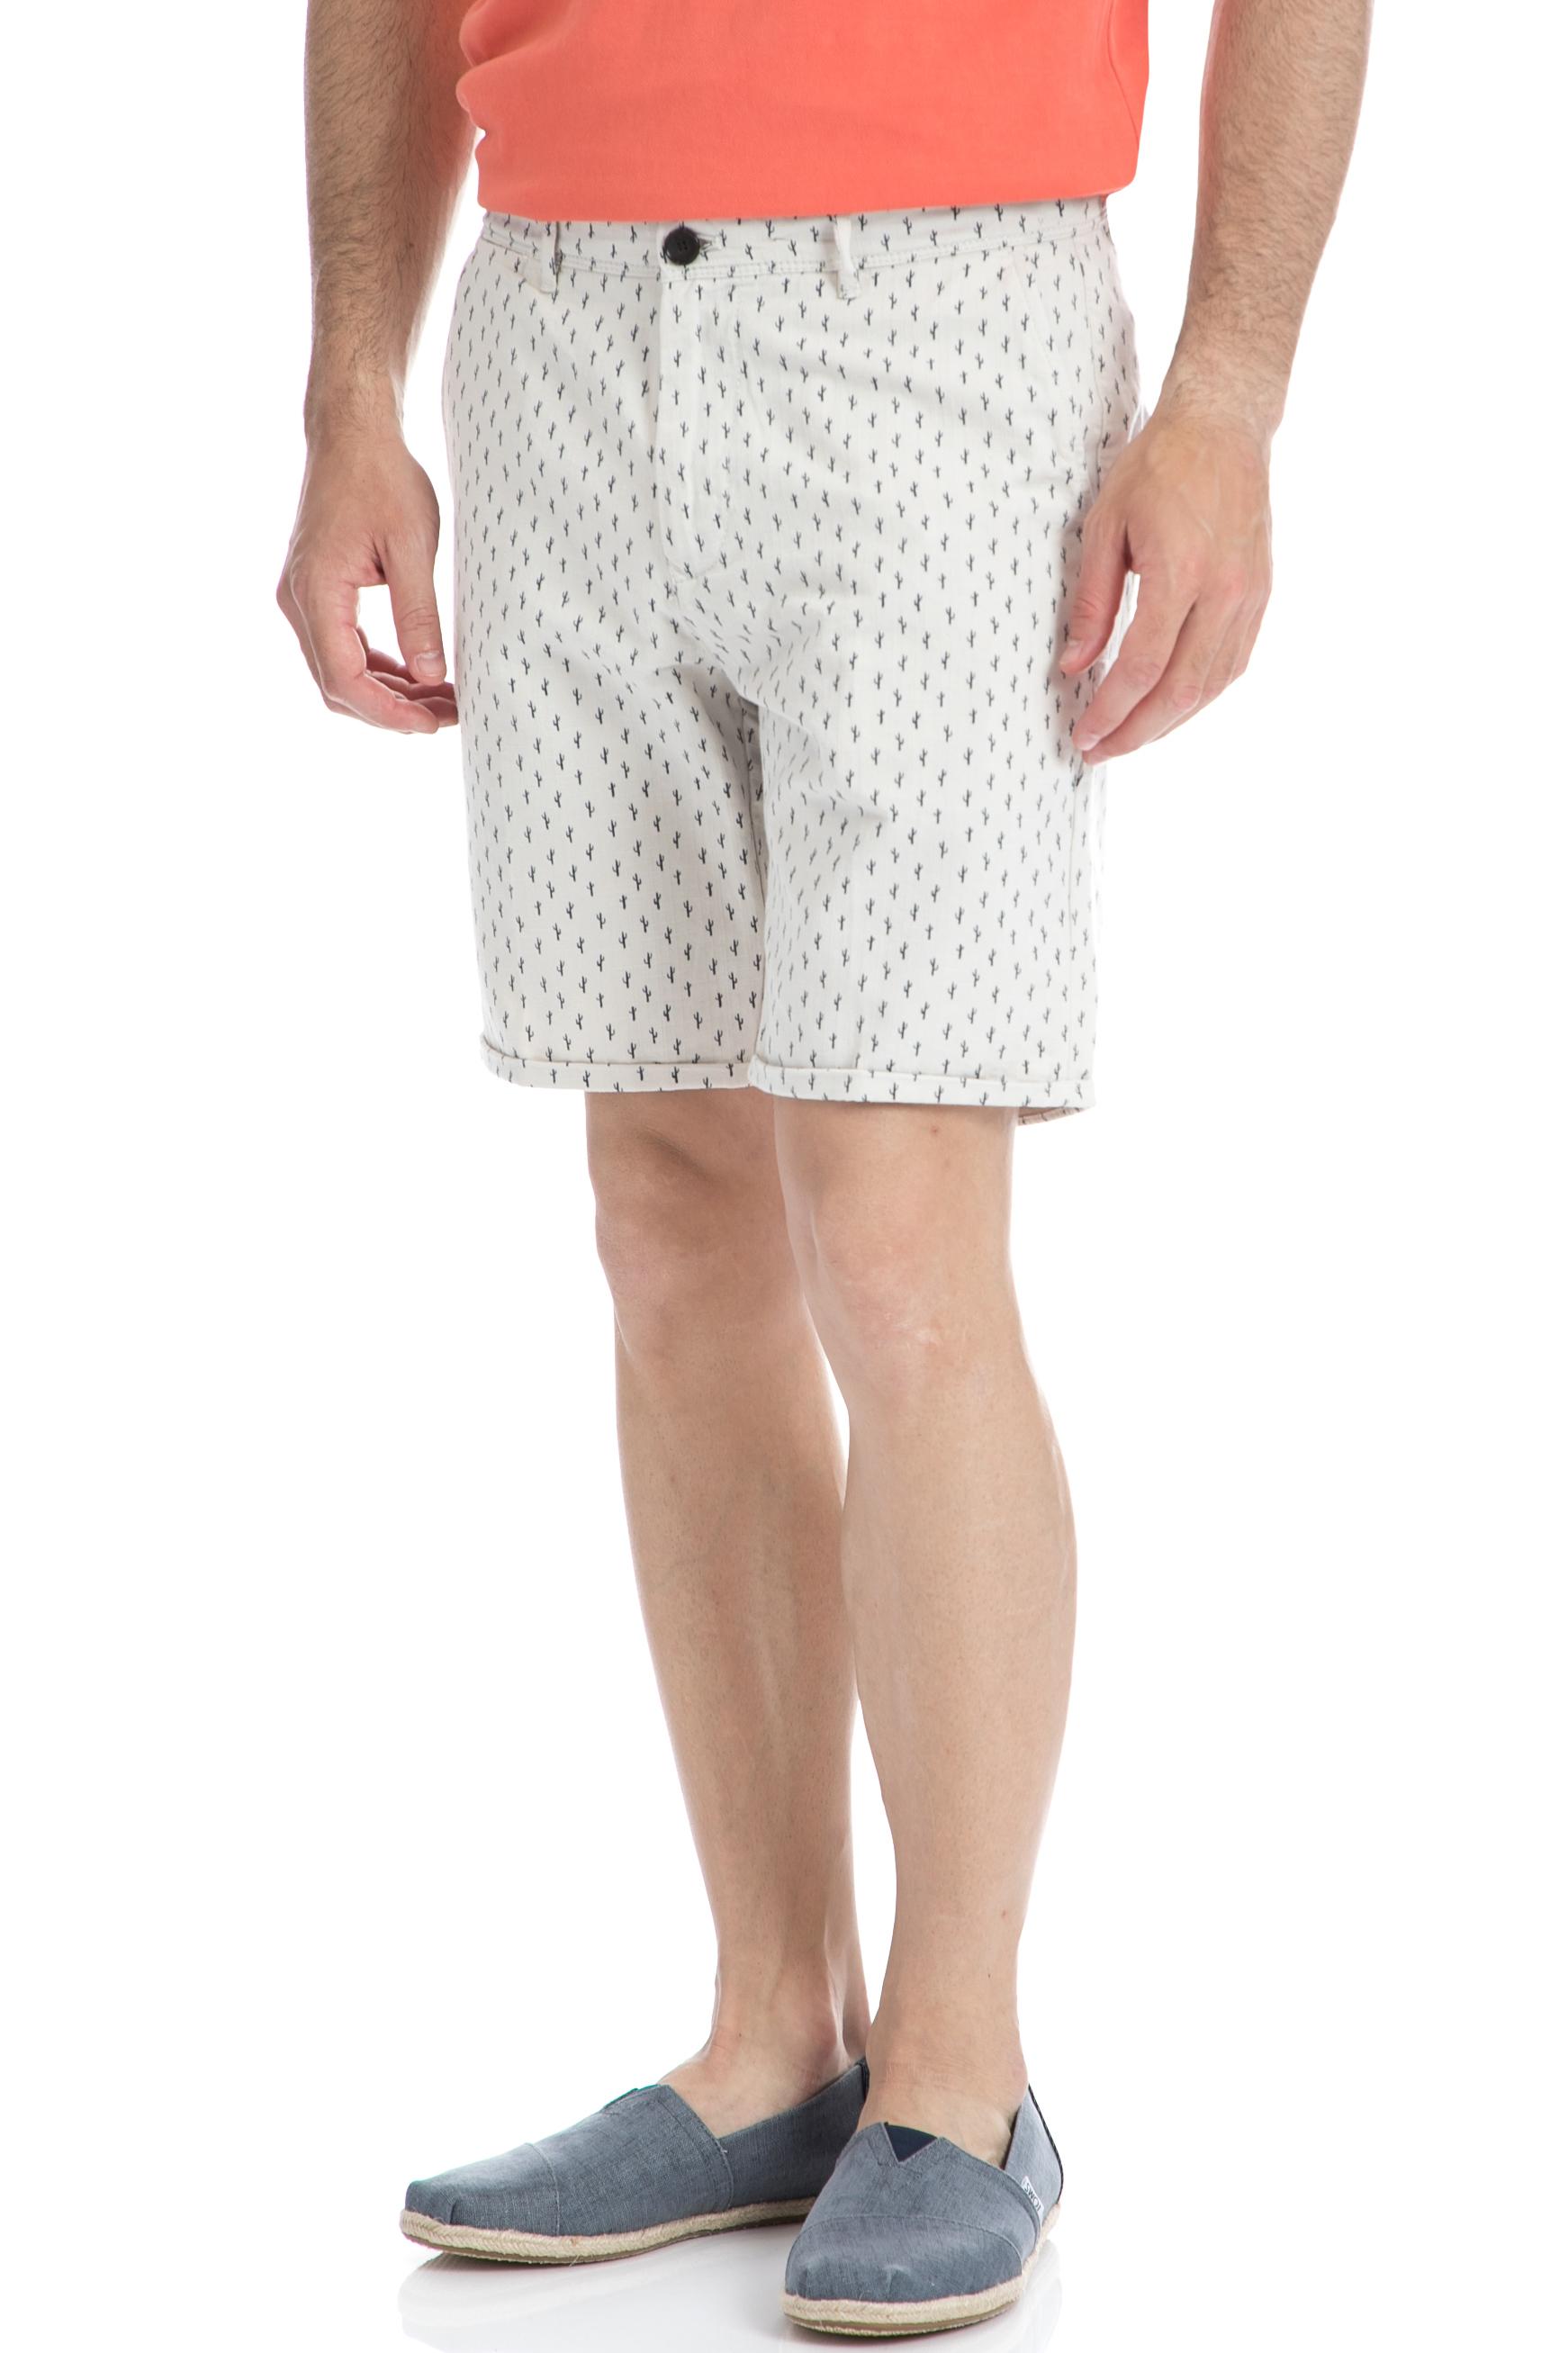 SCOTCH & SODA - Ανδρική βερμούδα SCOTCH & SODA λευκή ανδρικά ρούχα σορτς βερμούδες casual jean